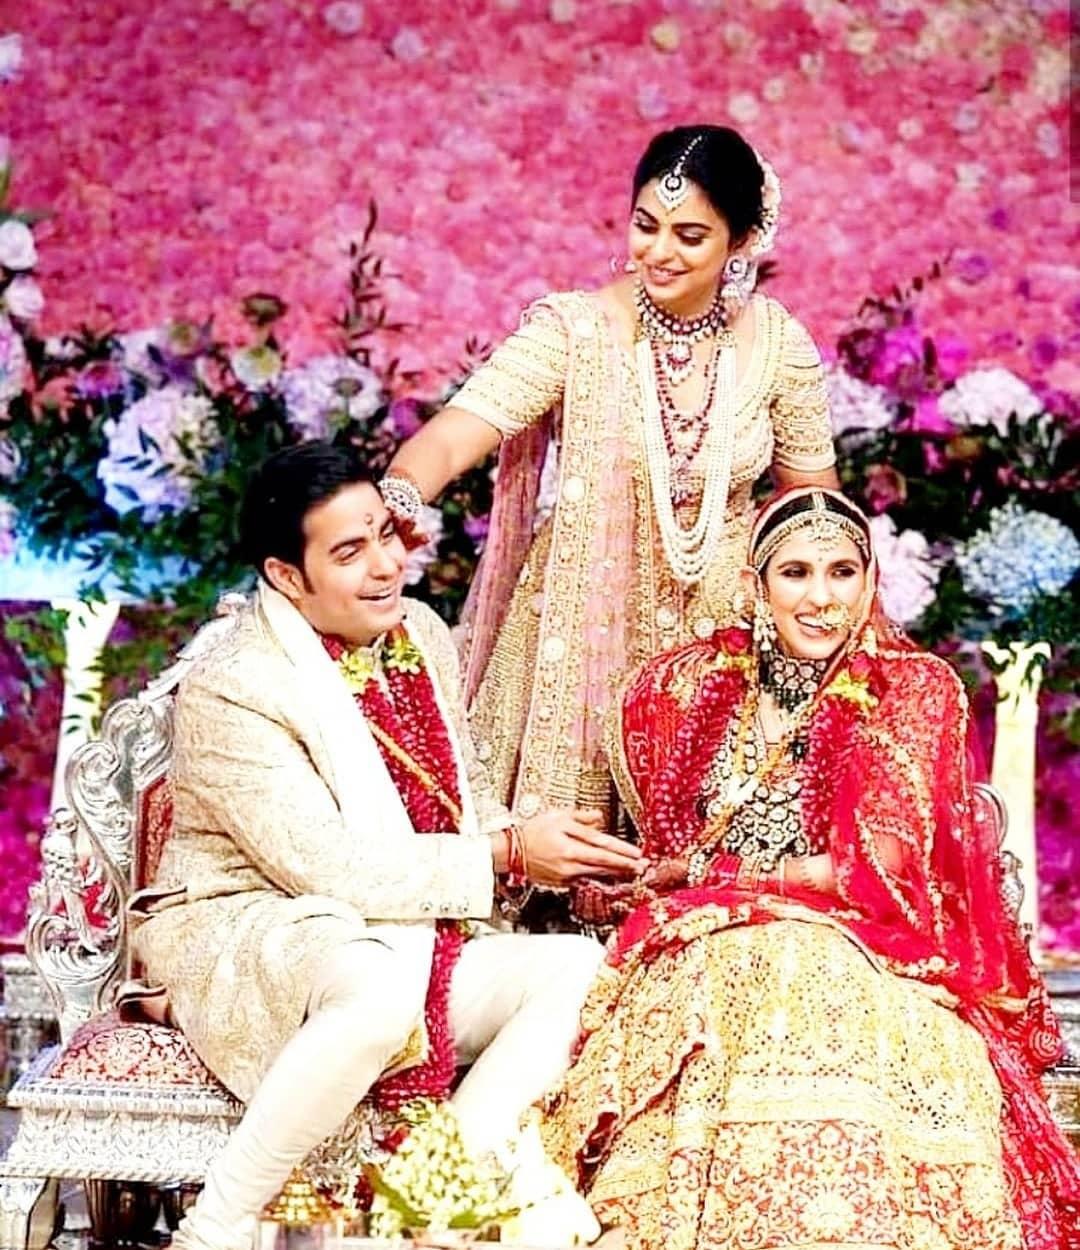 mukesh ambani wedding